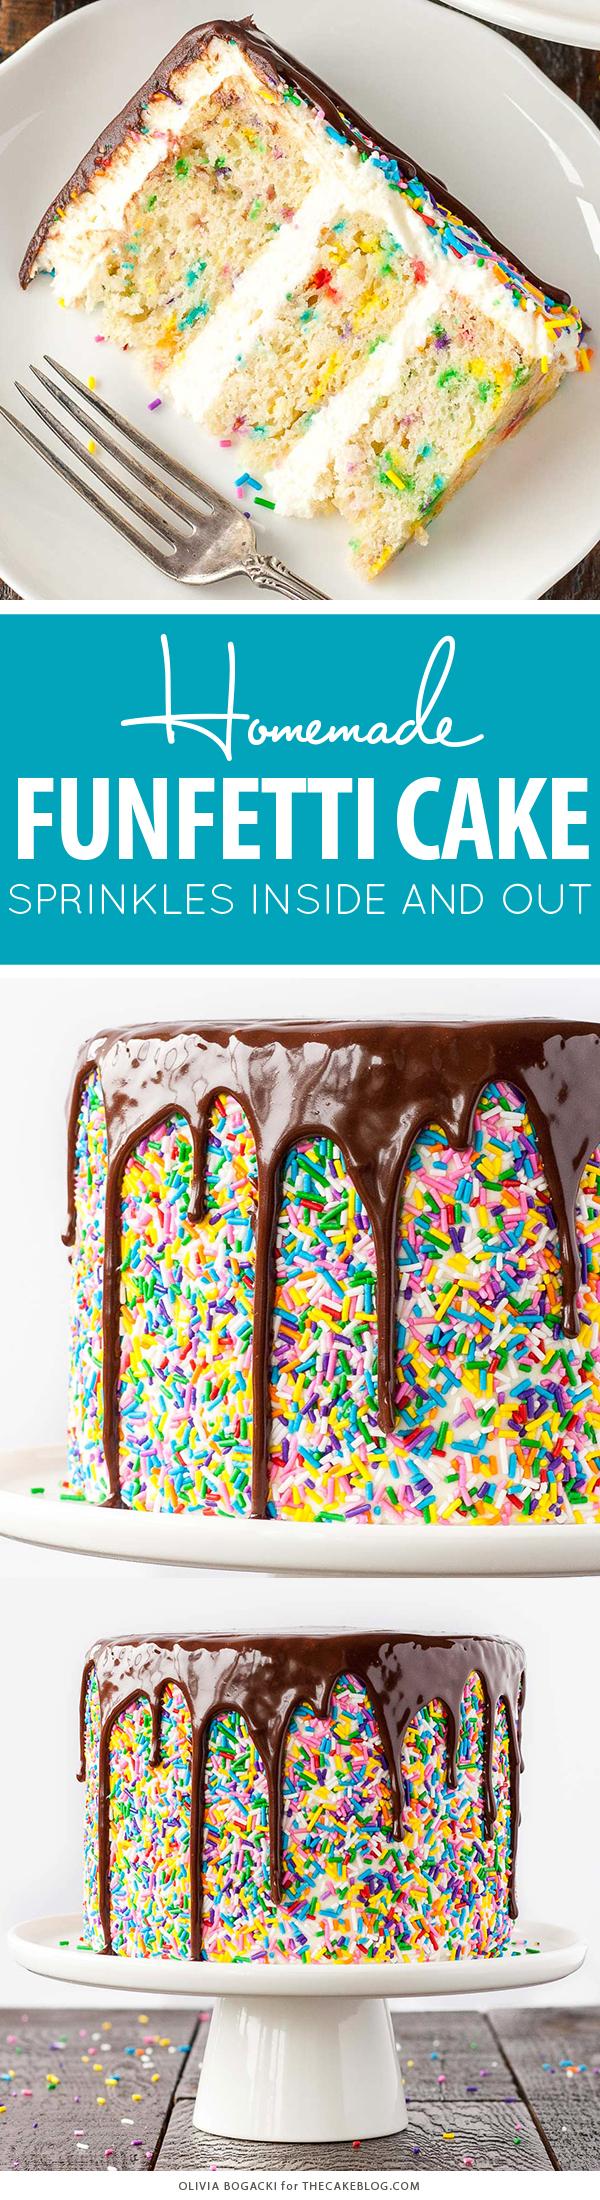 Funfetti Cake - homemade funfetti layer cake recipe   by Olivia Bogacki for TheCakeBlog.com #cake #funfetti #birthday #sprinkles